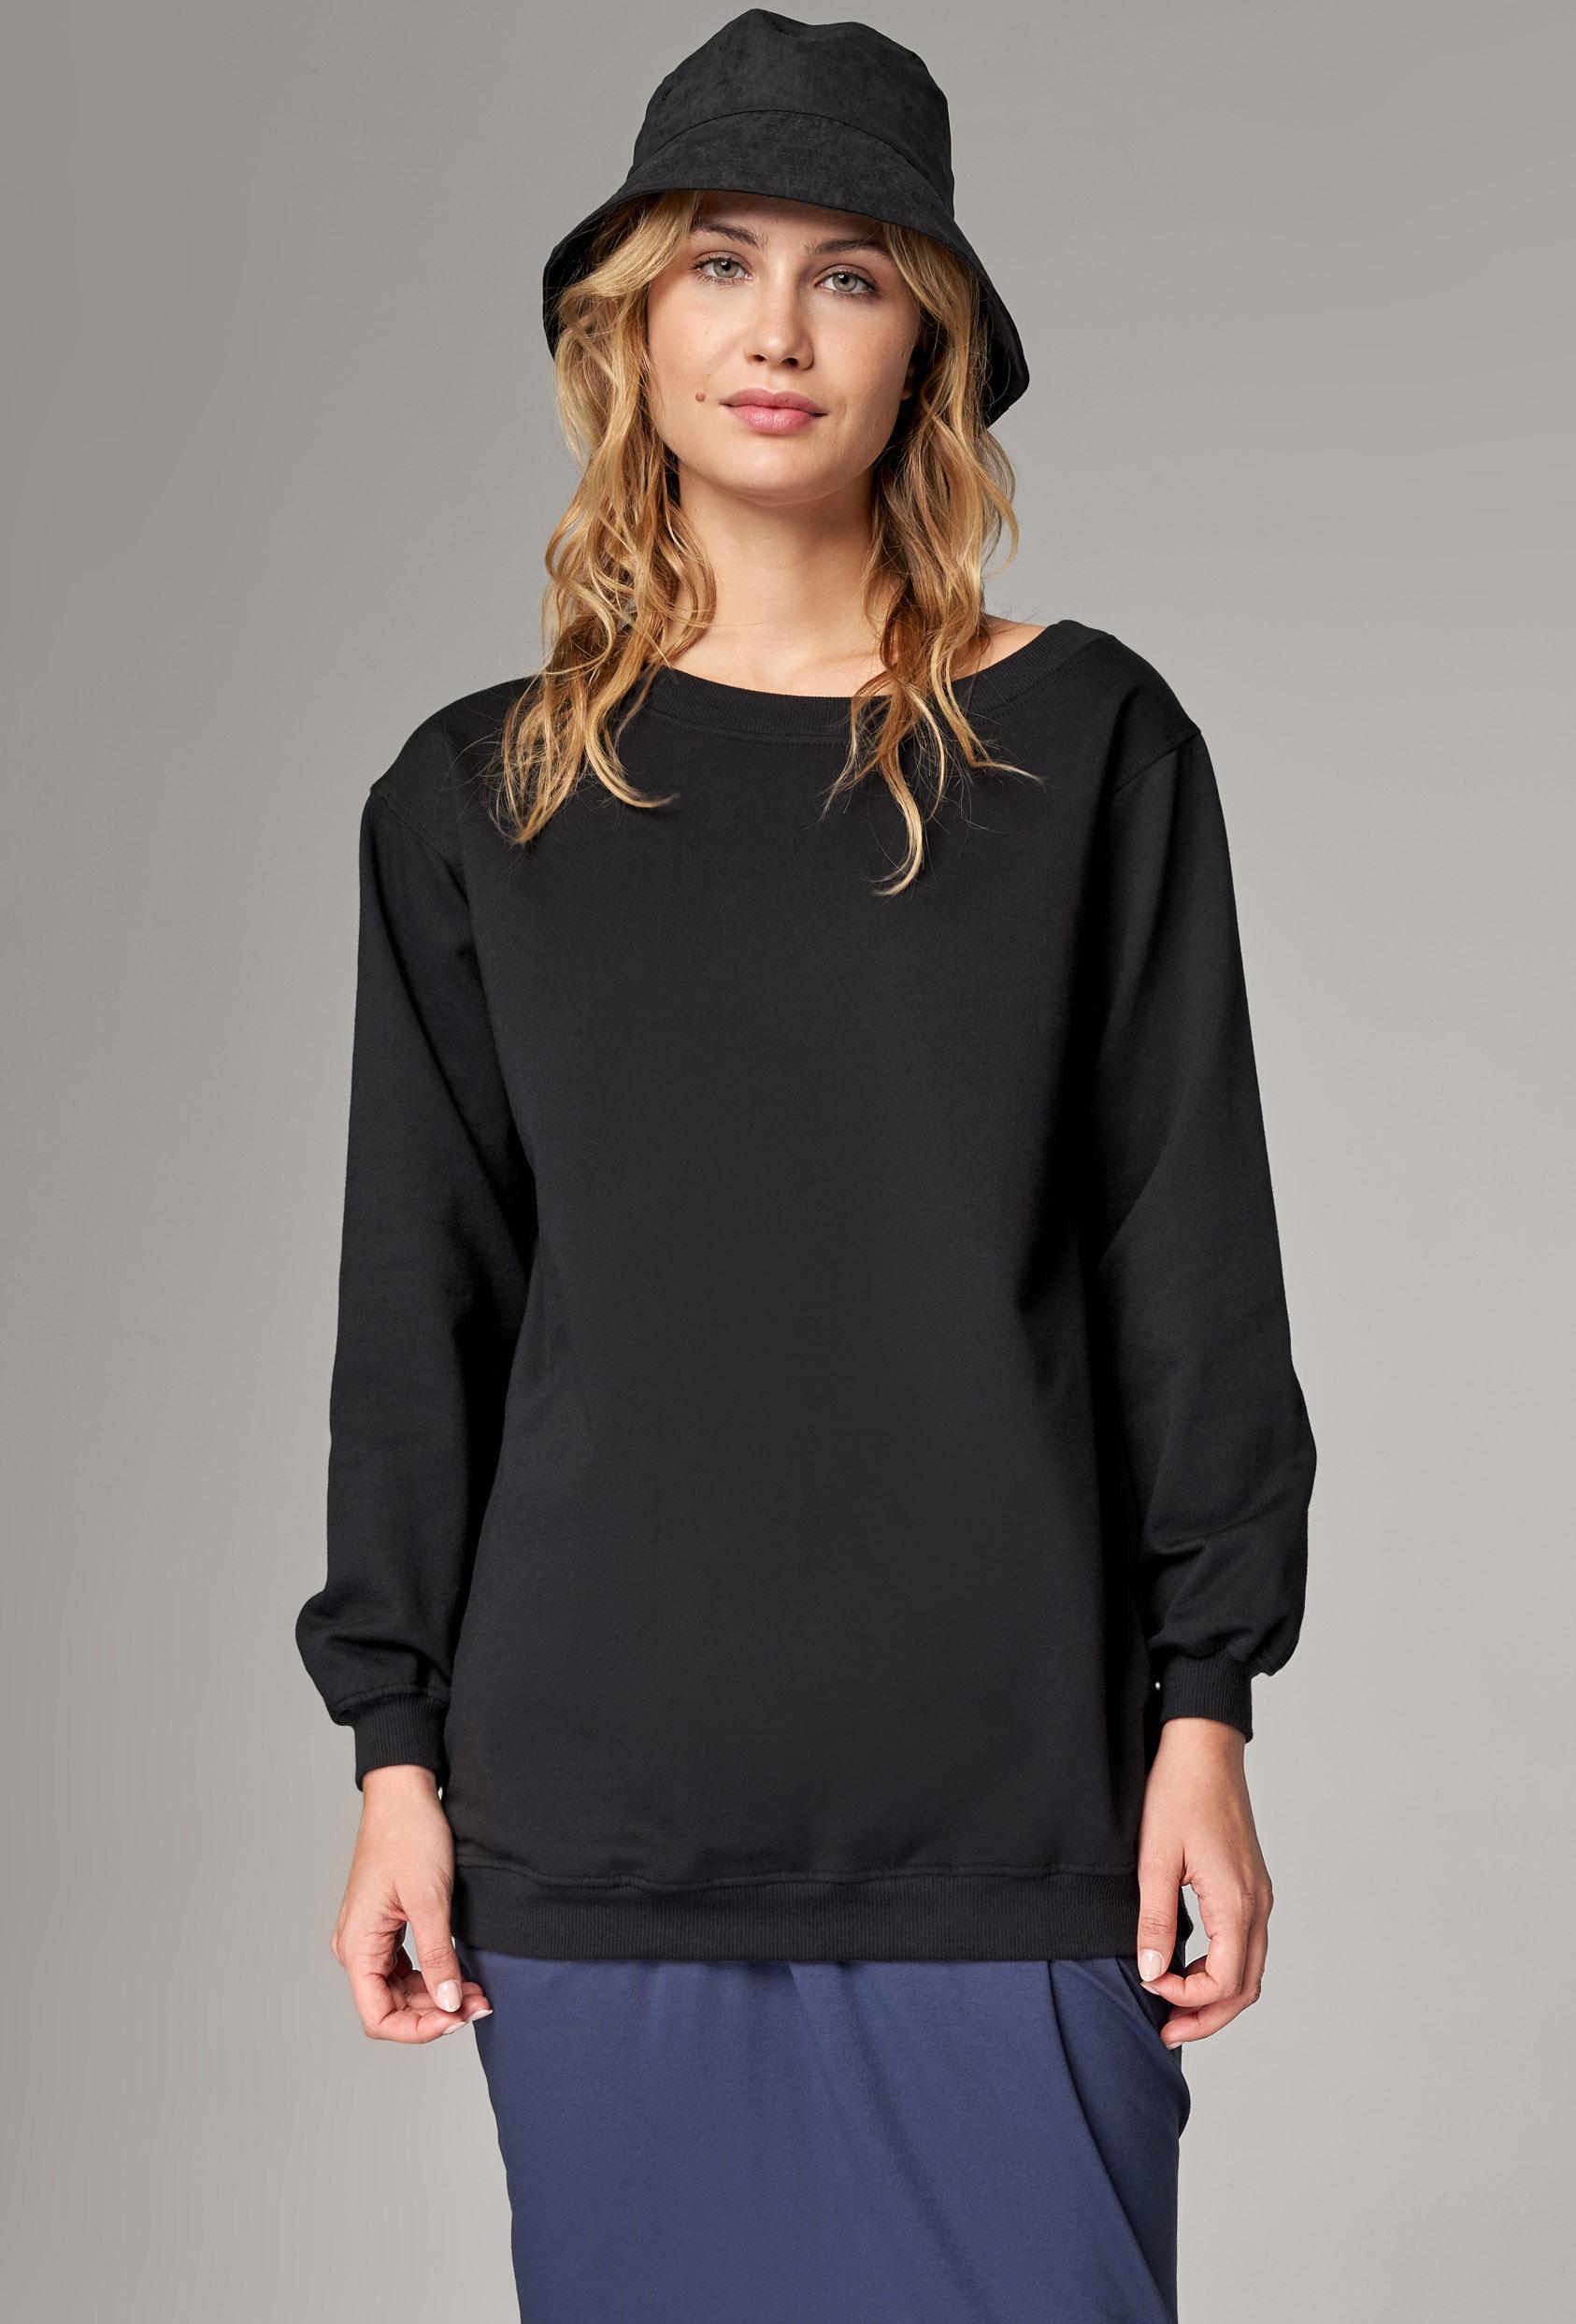 Bluza prosta INDIA BLOUSE czarna